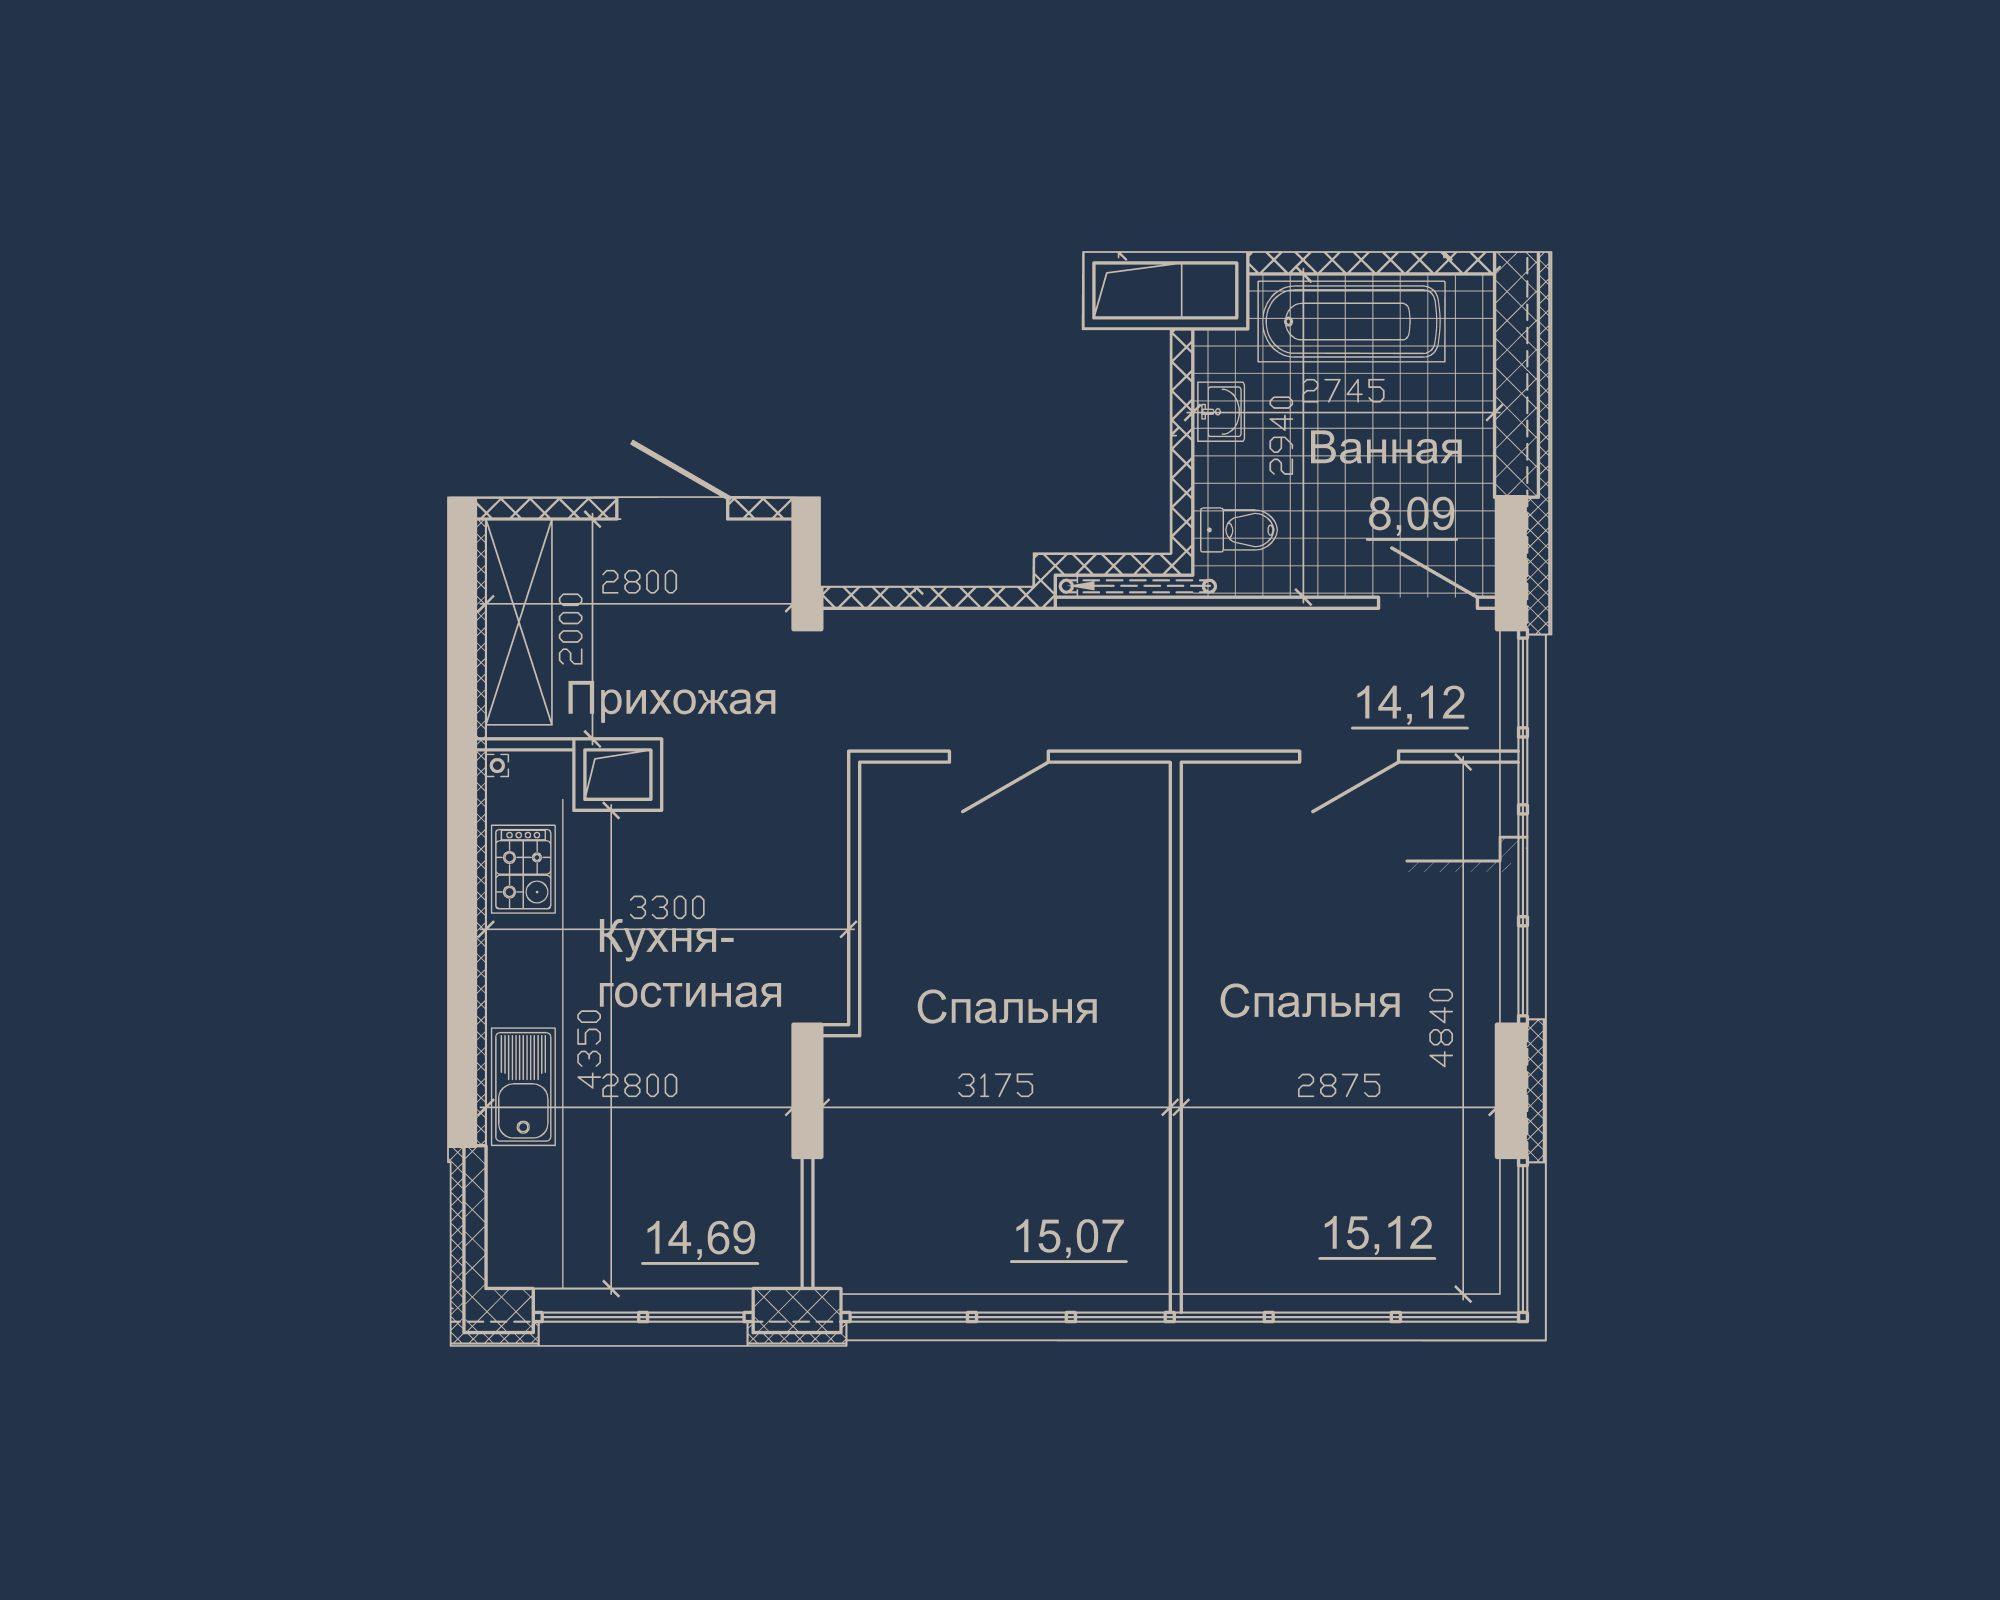 2-кімнатна квартира типу 10А-1 у ЖК Nebo